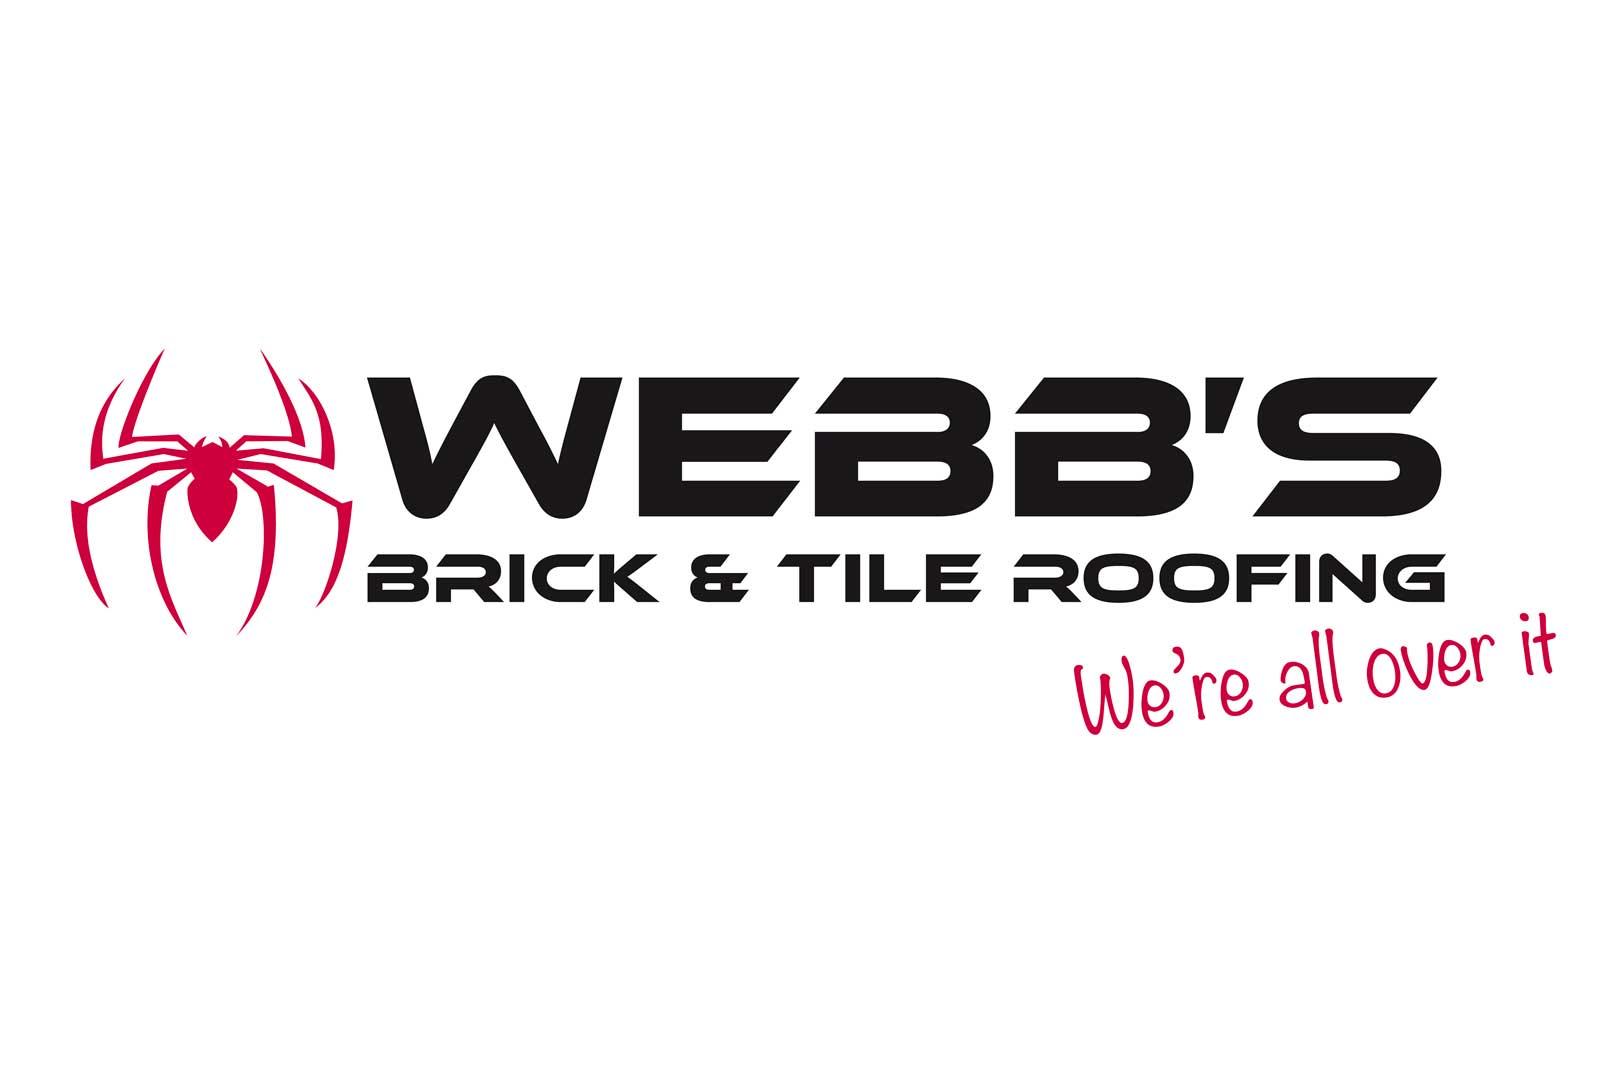 Webb's Brick & Tile Roofing